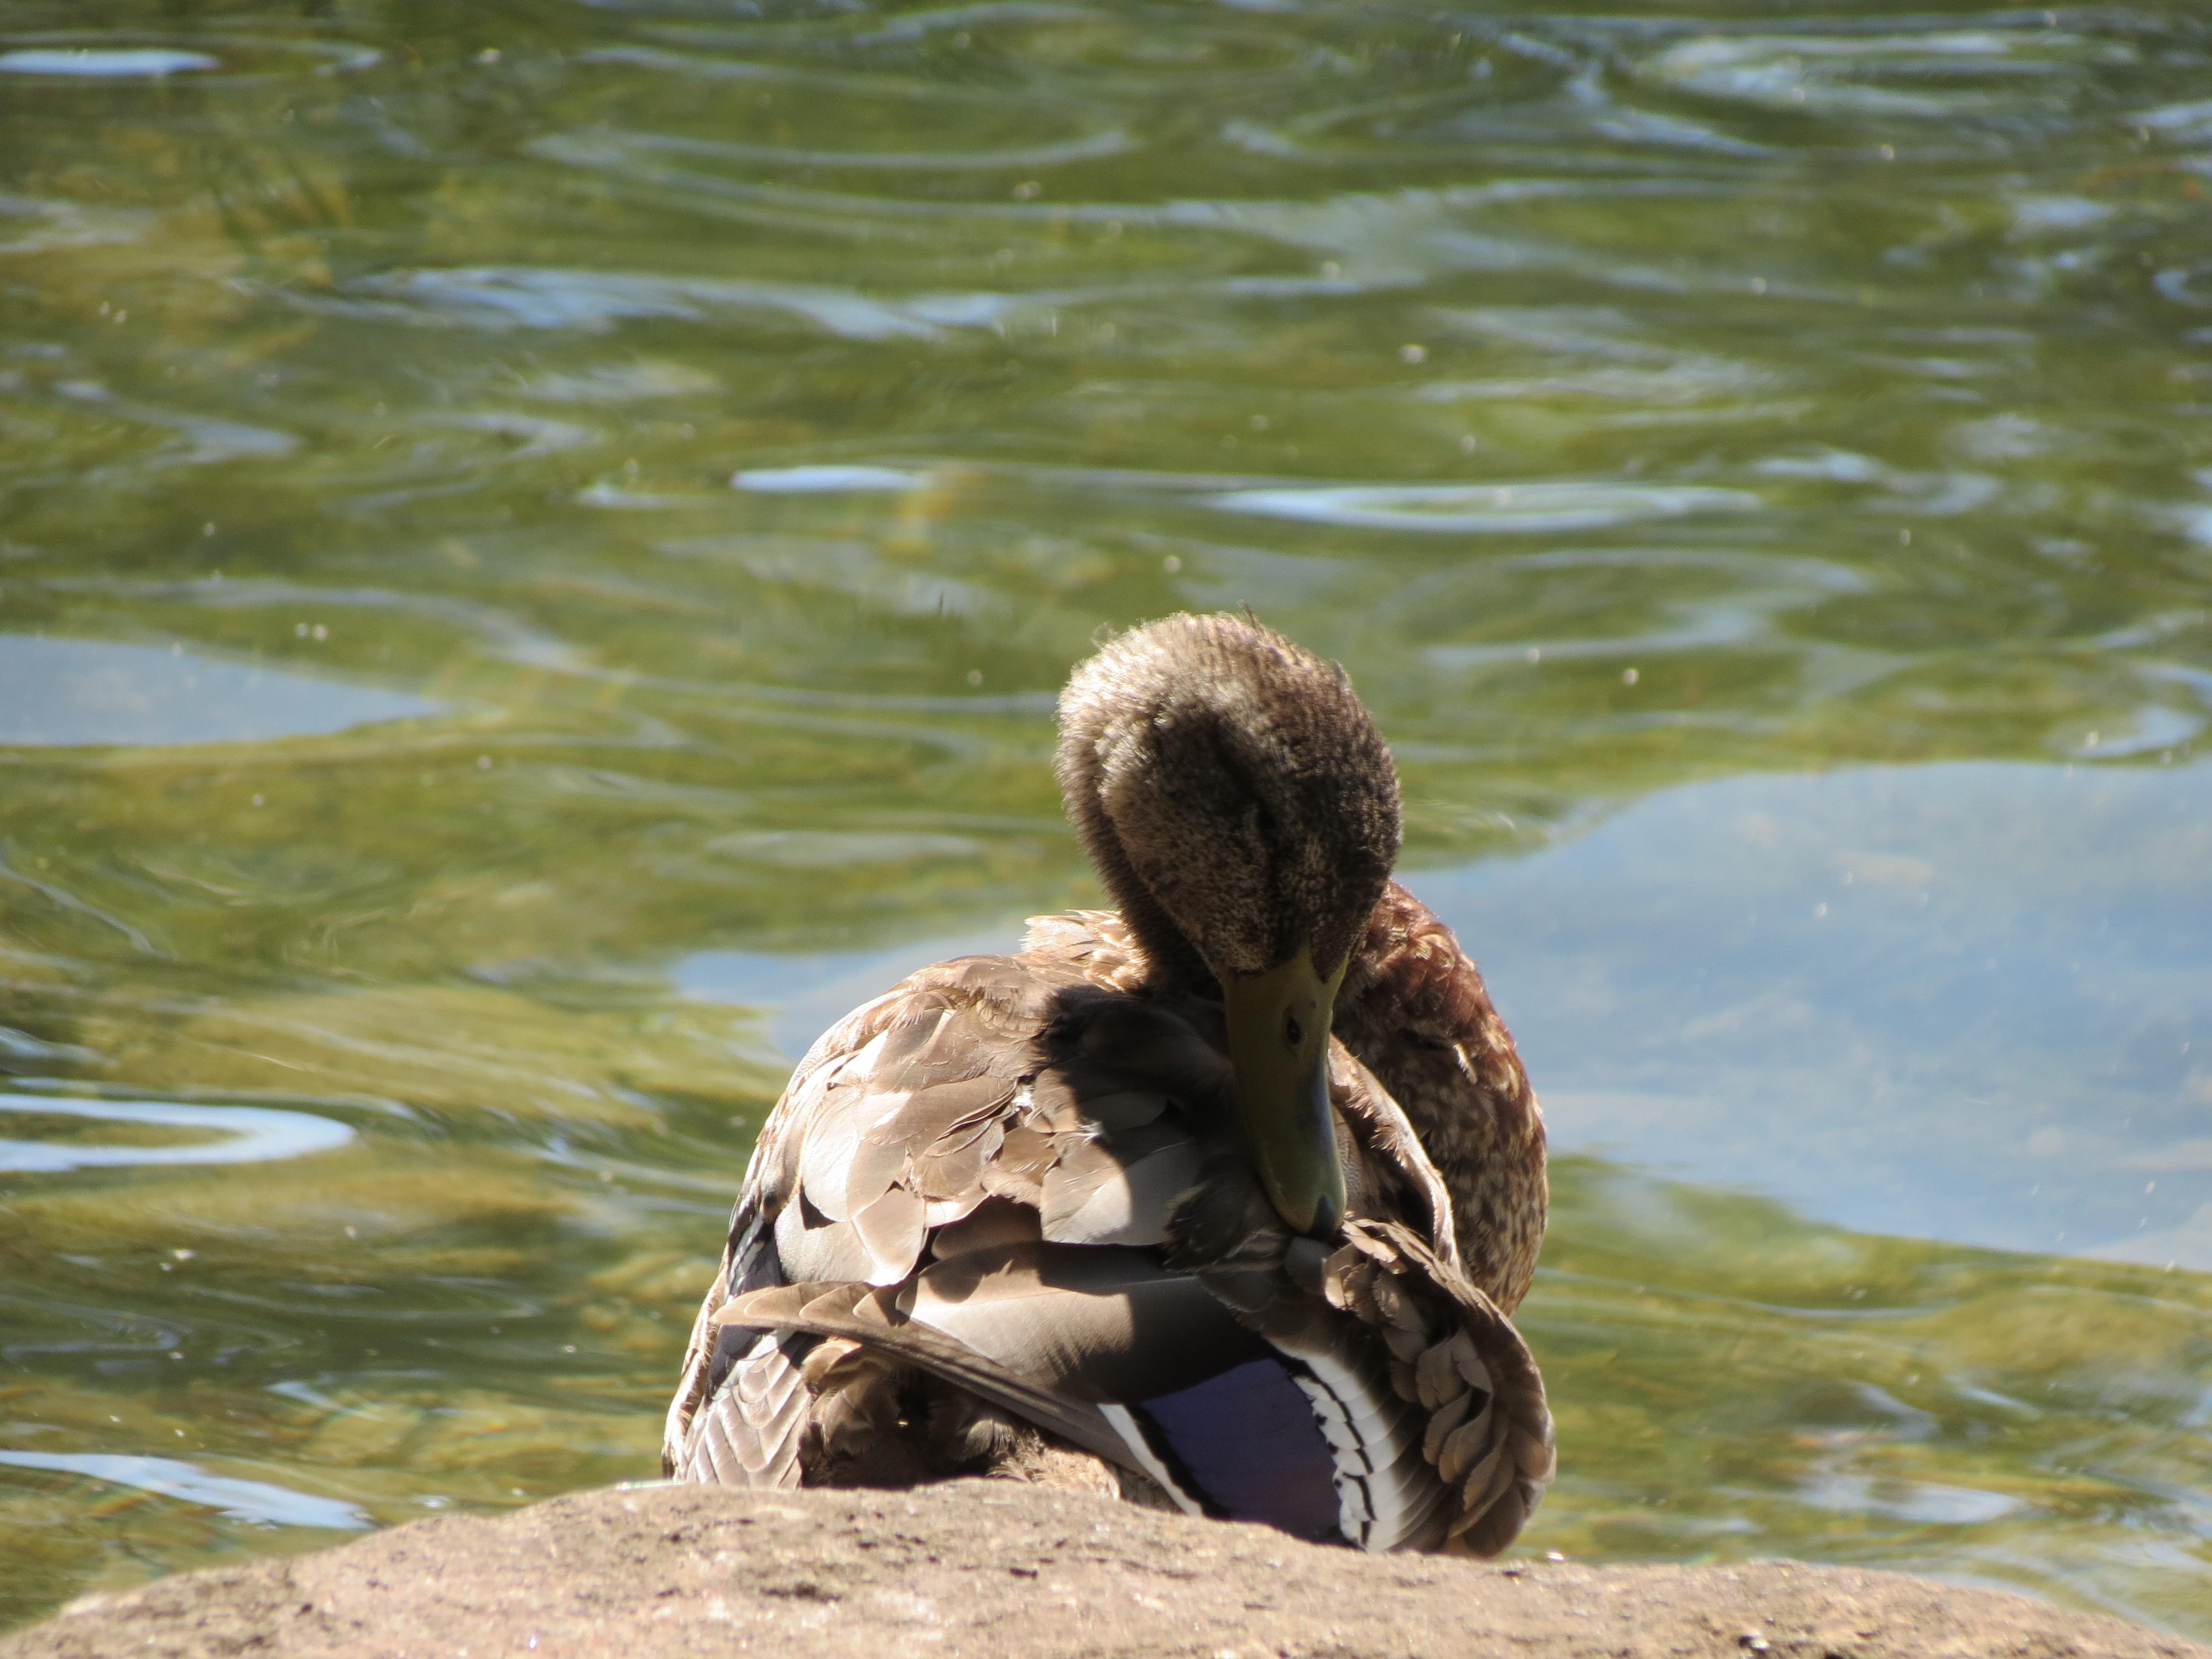 Duck_grooming